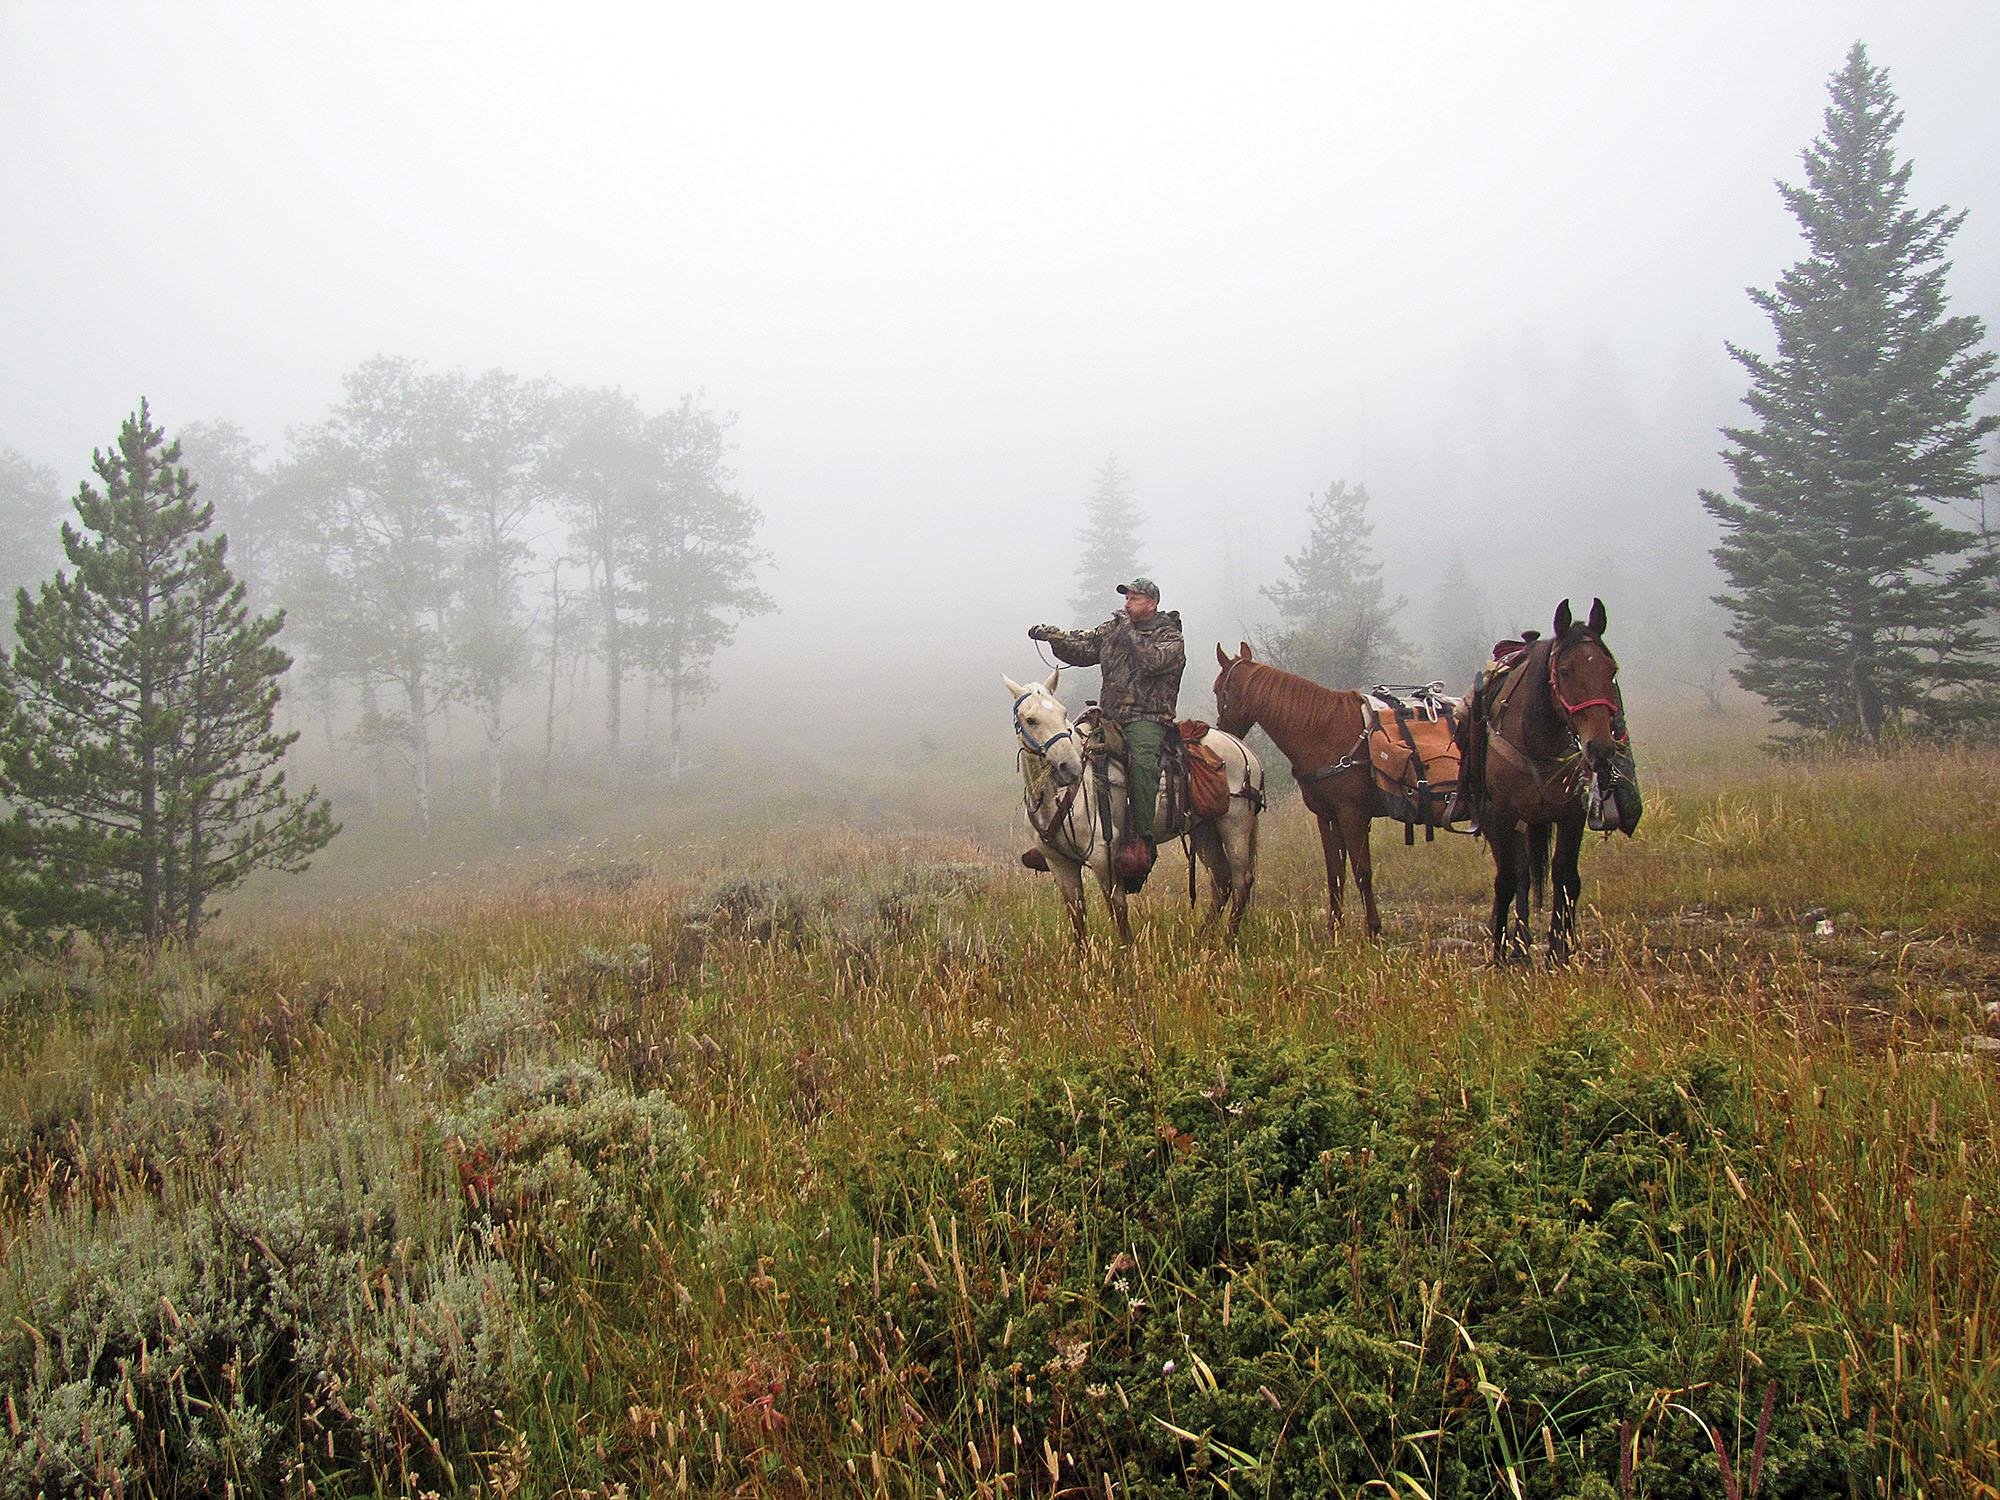 horseback hunting in the fog.